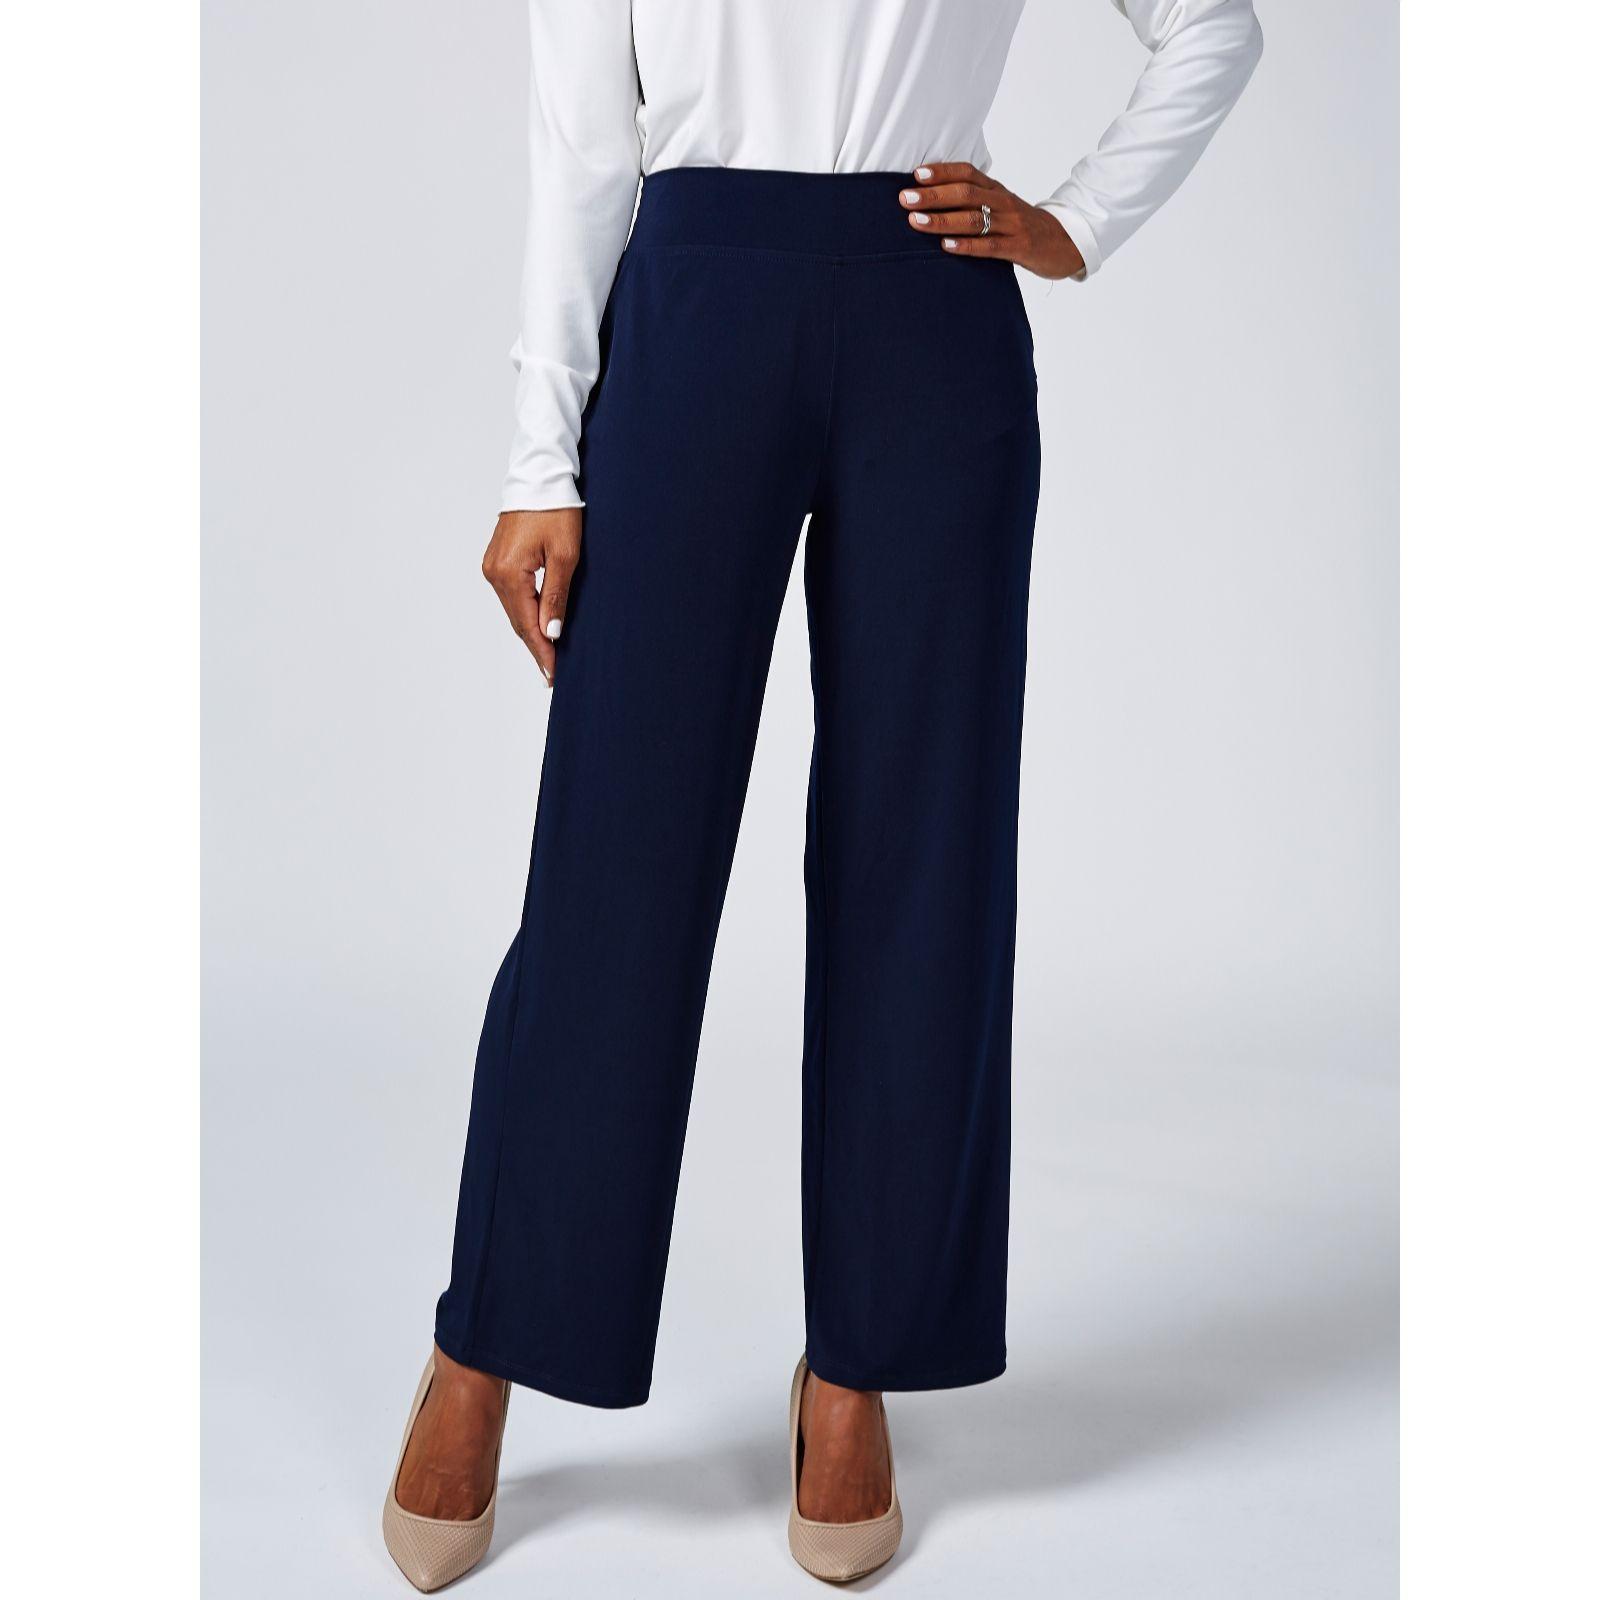 Kim Co Brazil Jersey Relaxed Trousers Regular Length Qvc Uk